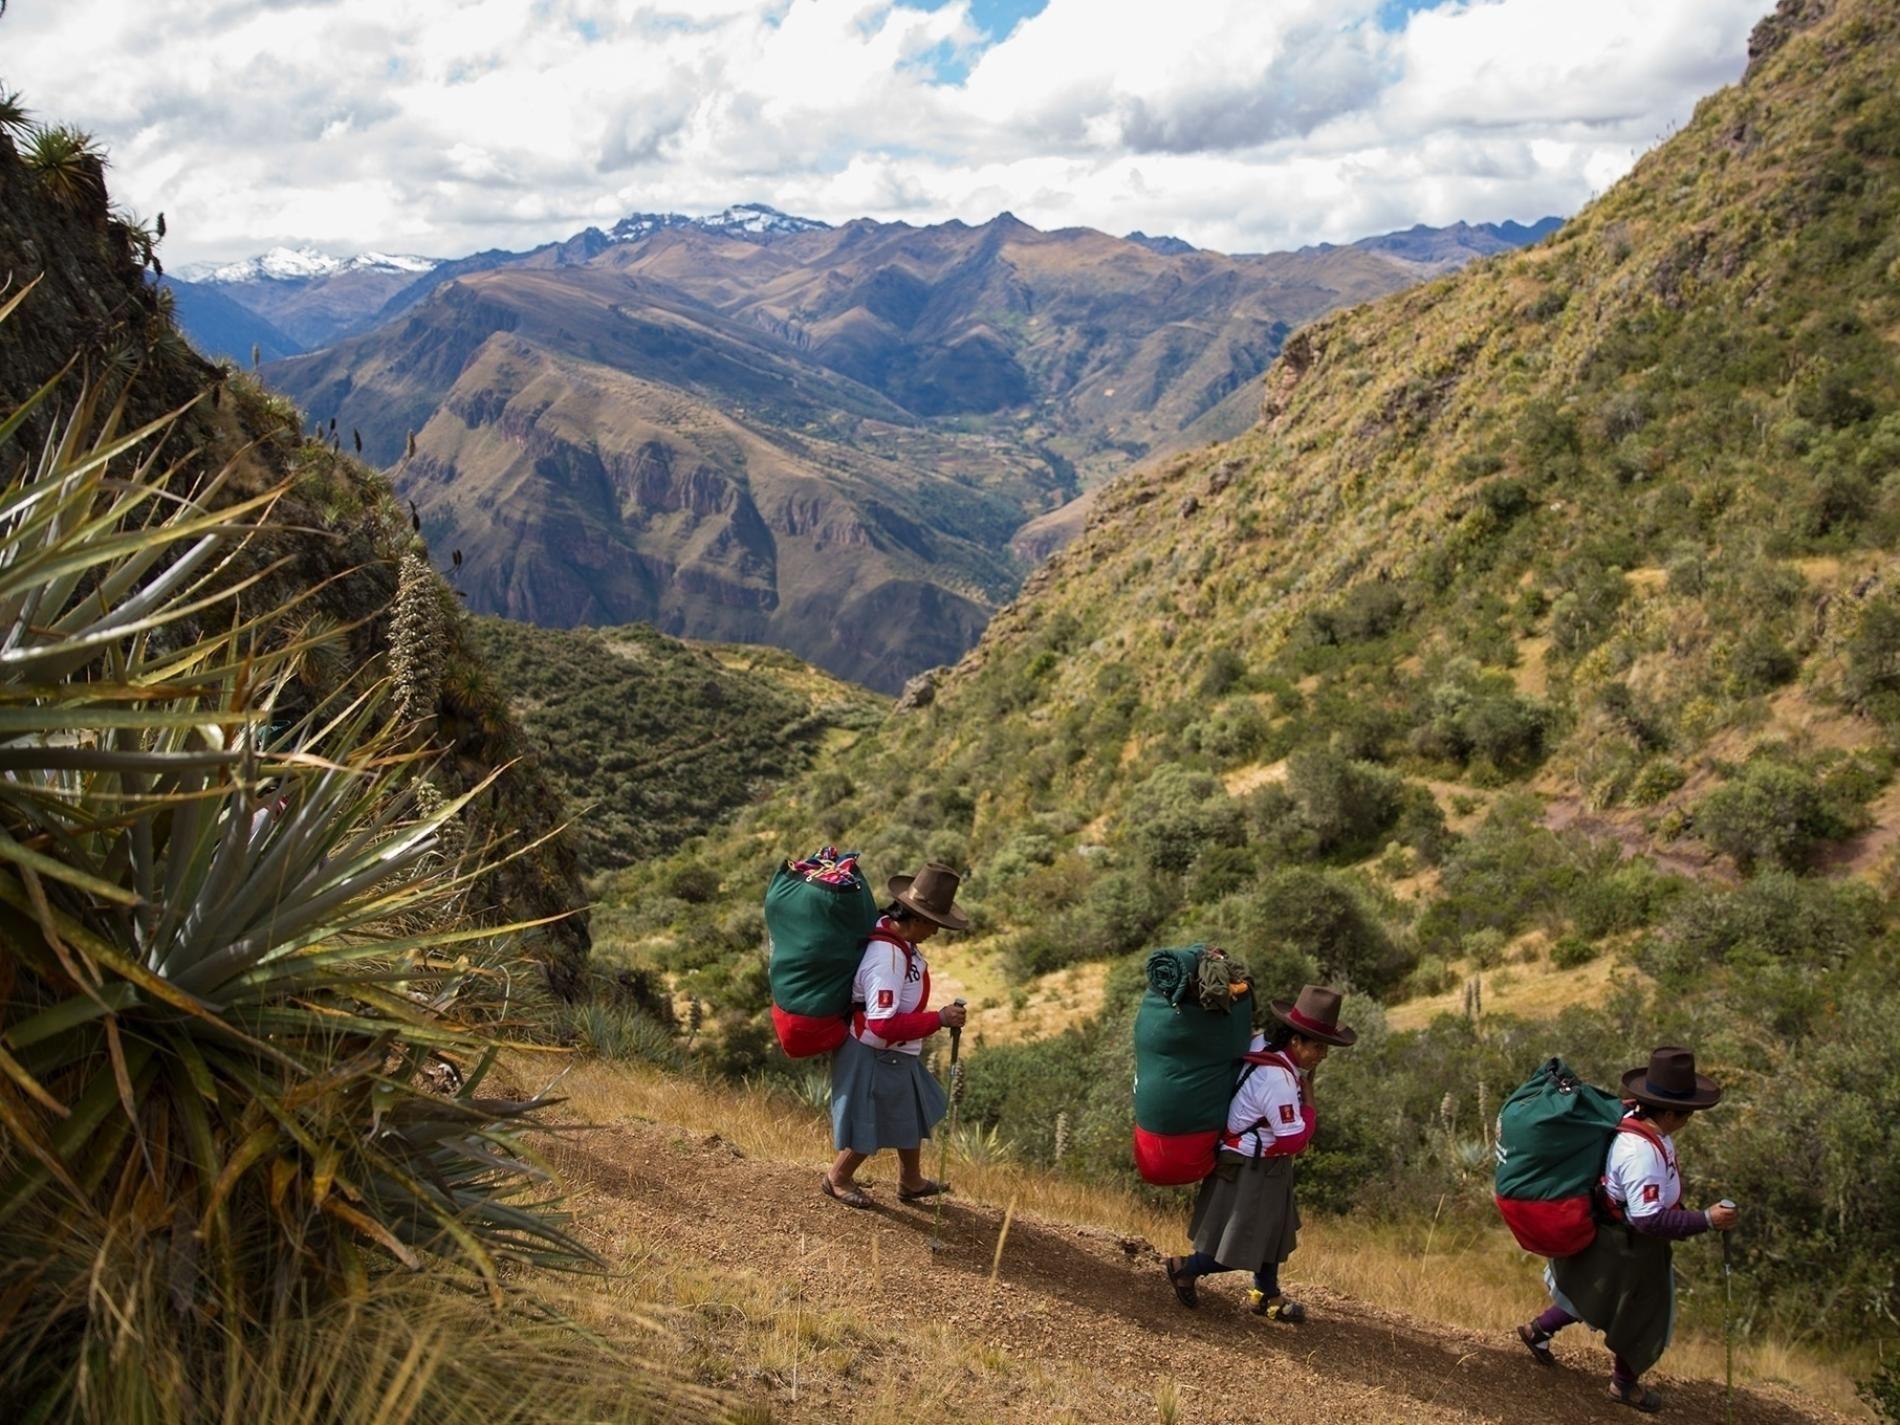 Meet The Women Making History On The Trail To Machu Picchu